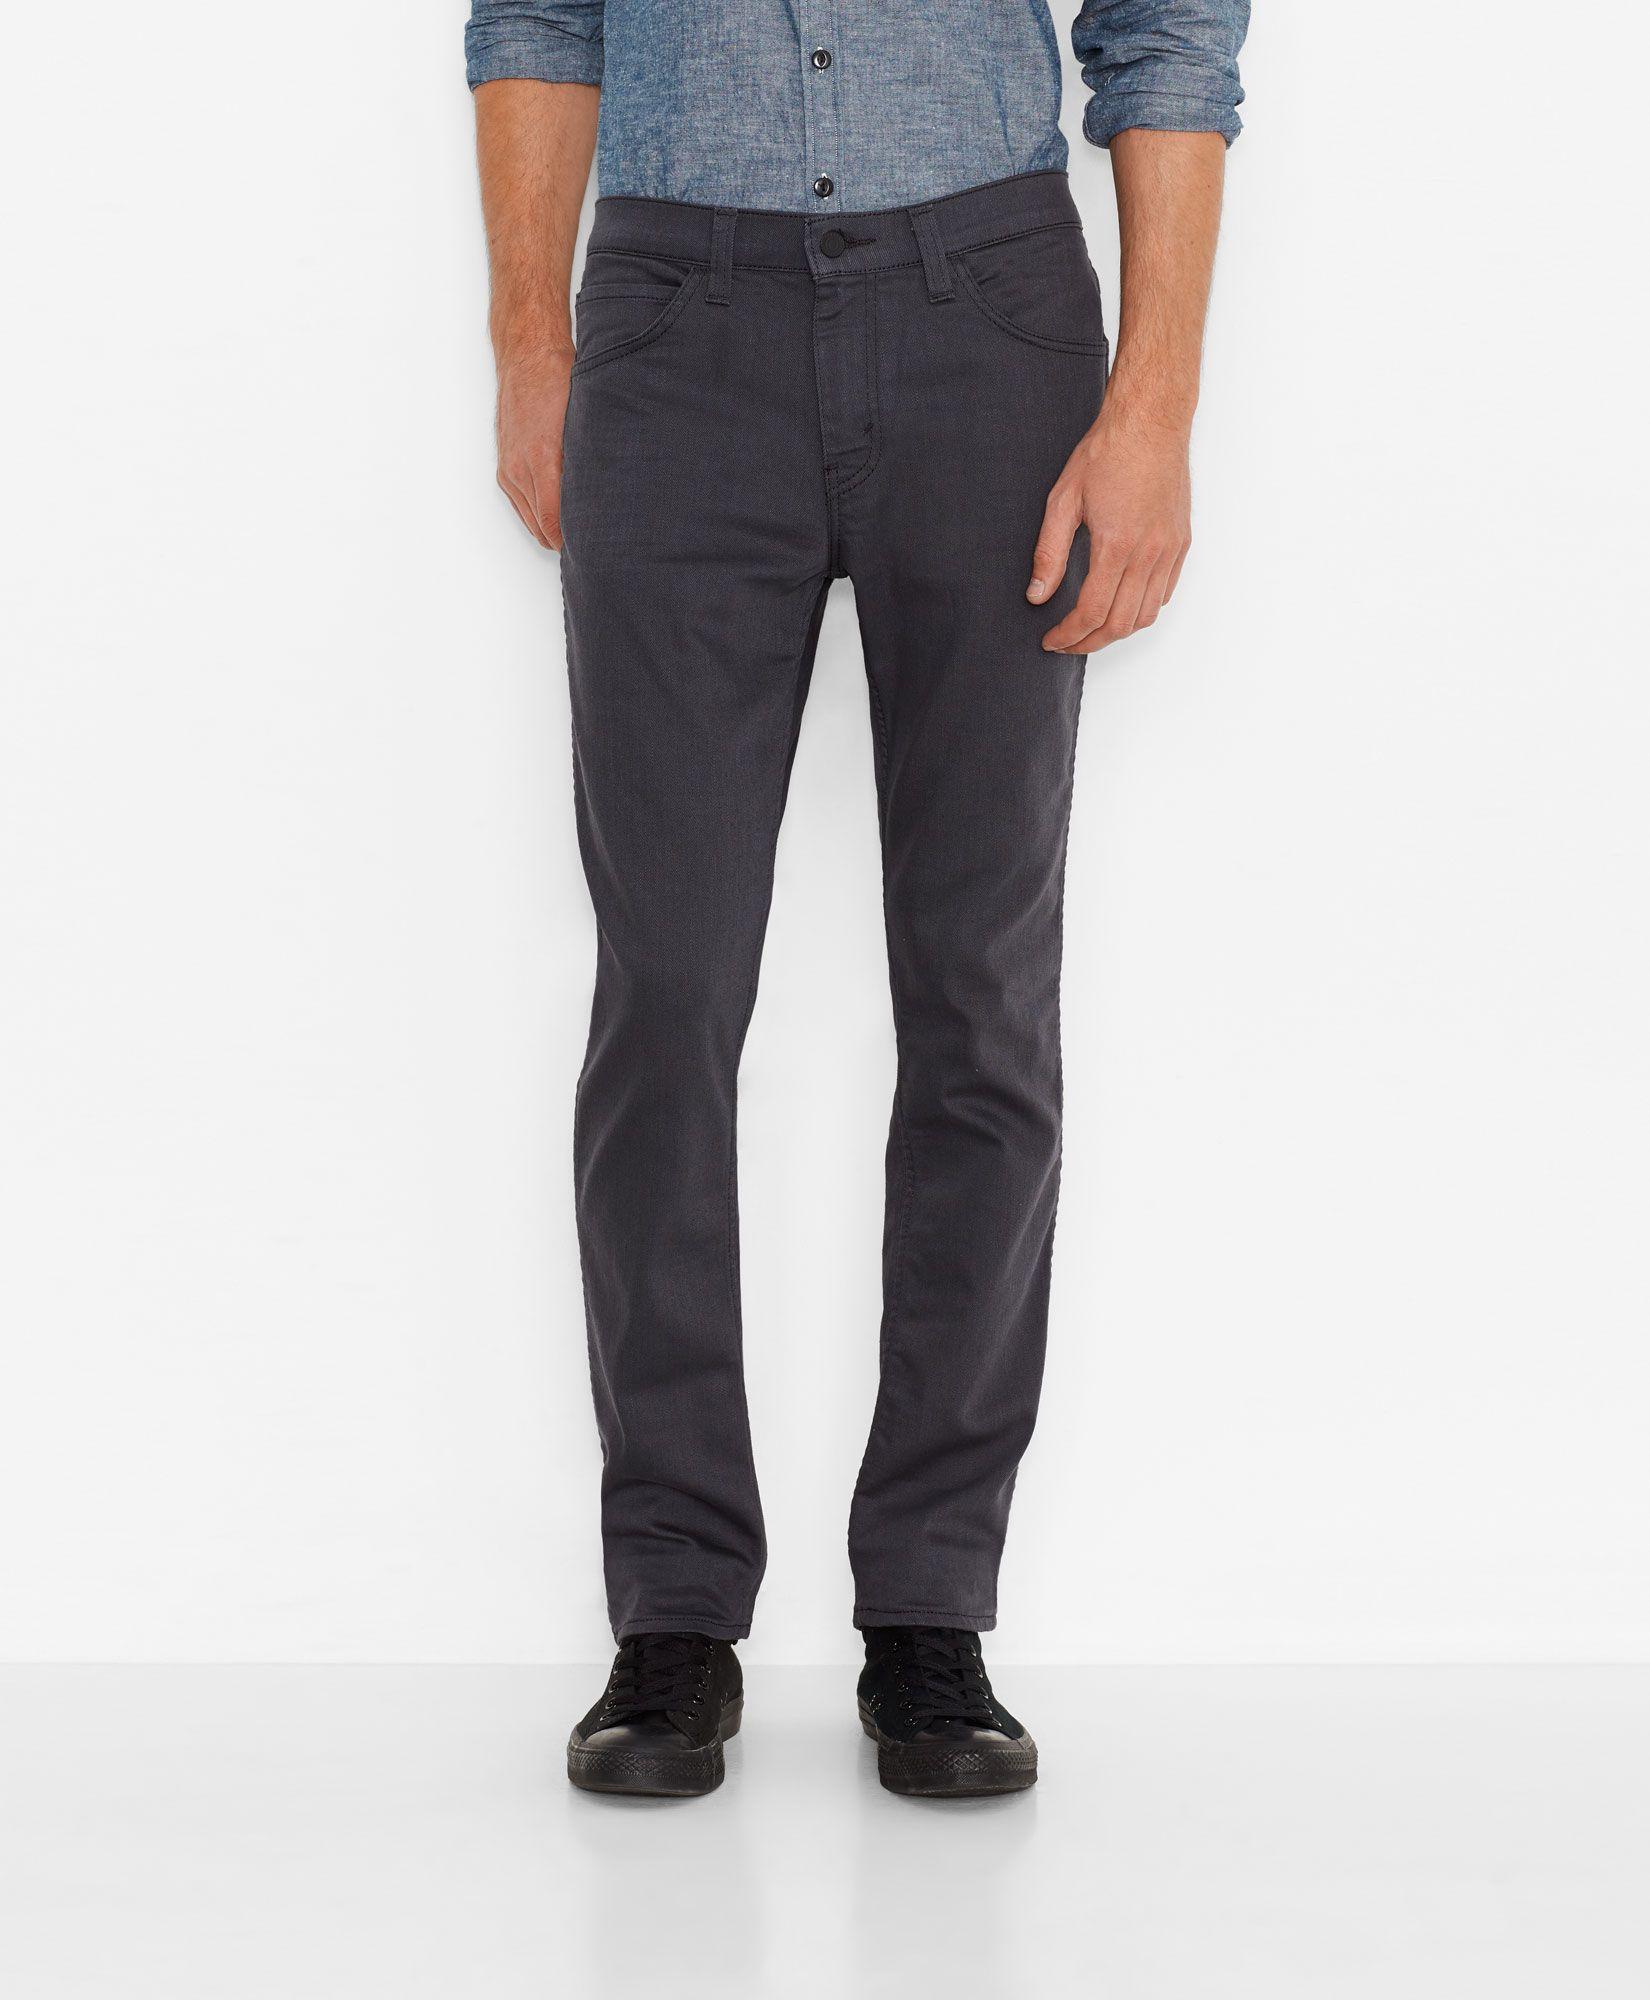 Levi's | 511™ Slim Fit Line 8 Jeans - Grey - Jeans